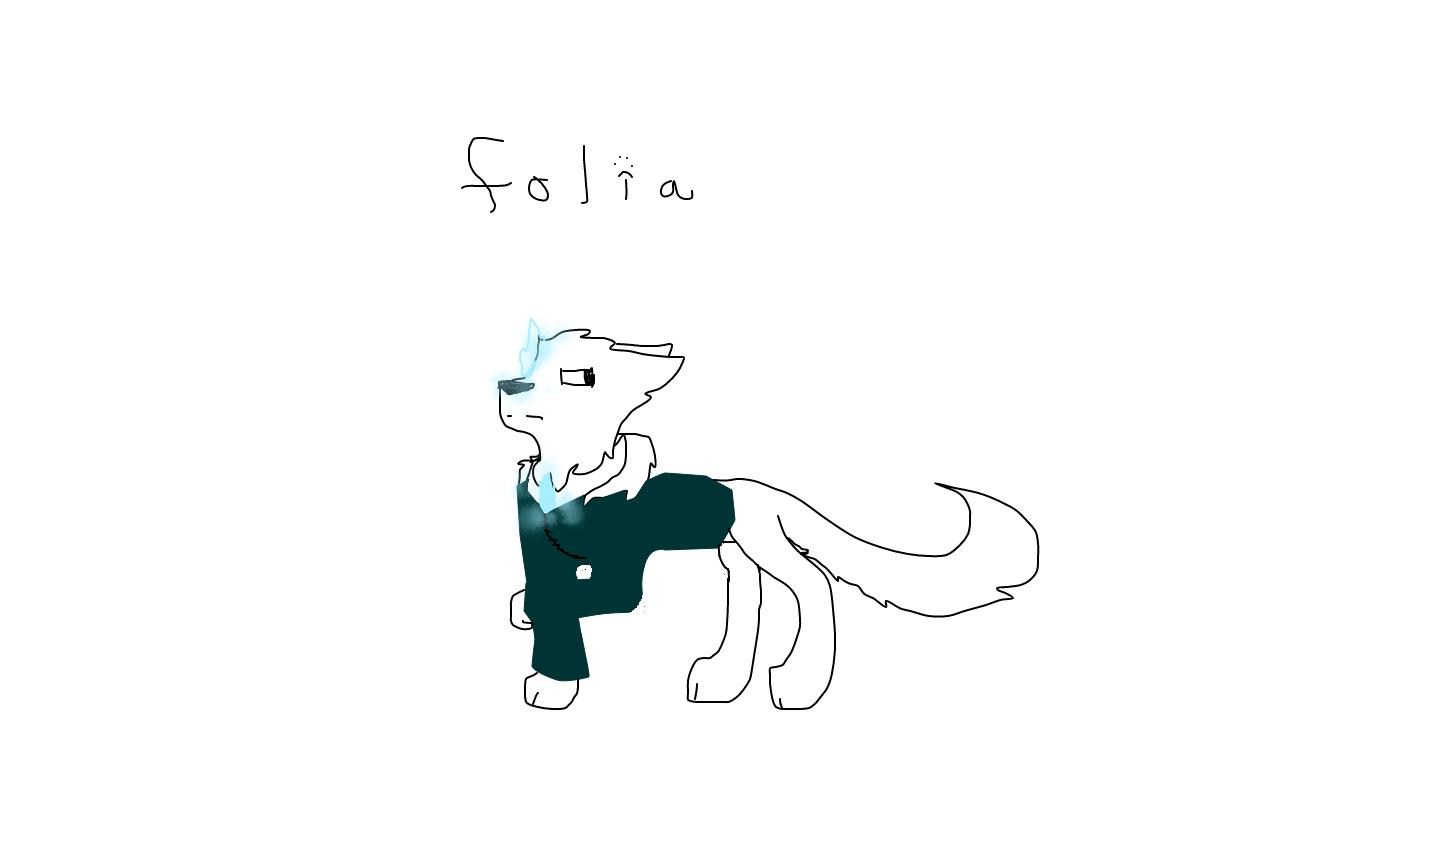 Folia by 3mburrHunturr